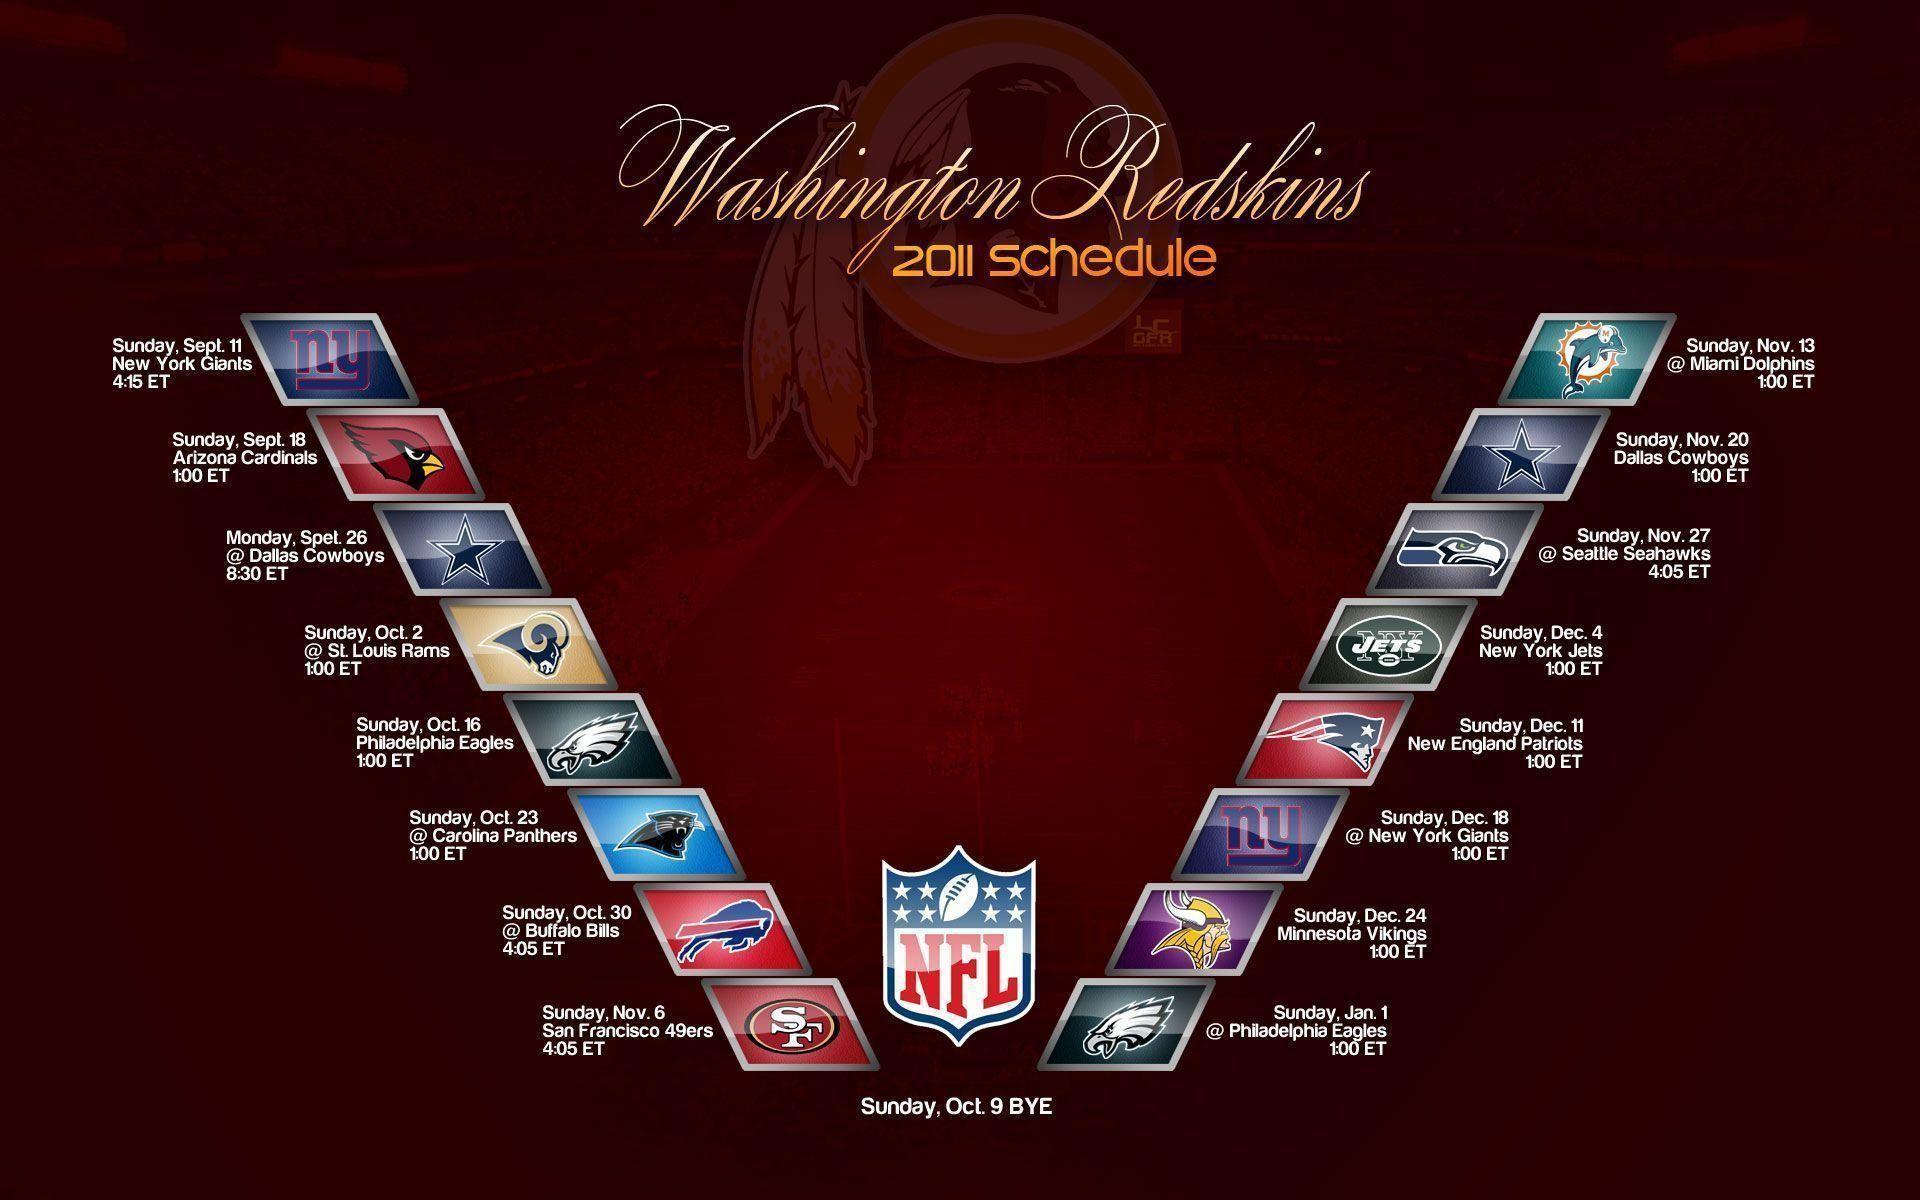 Redskins 2014 Schedule – Viewing Gallery